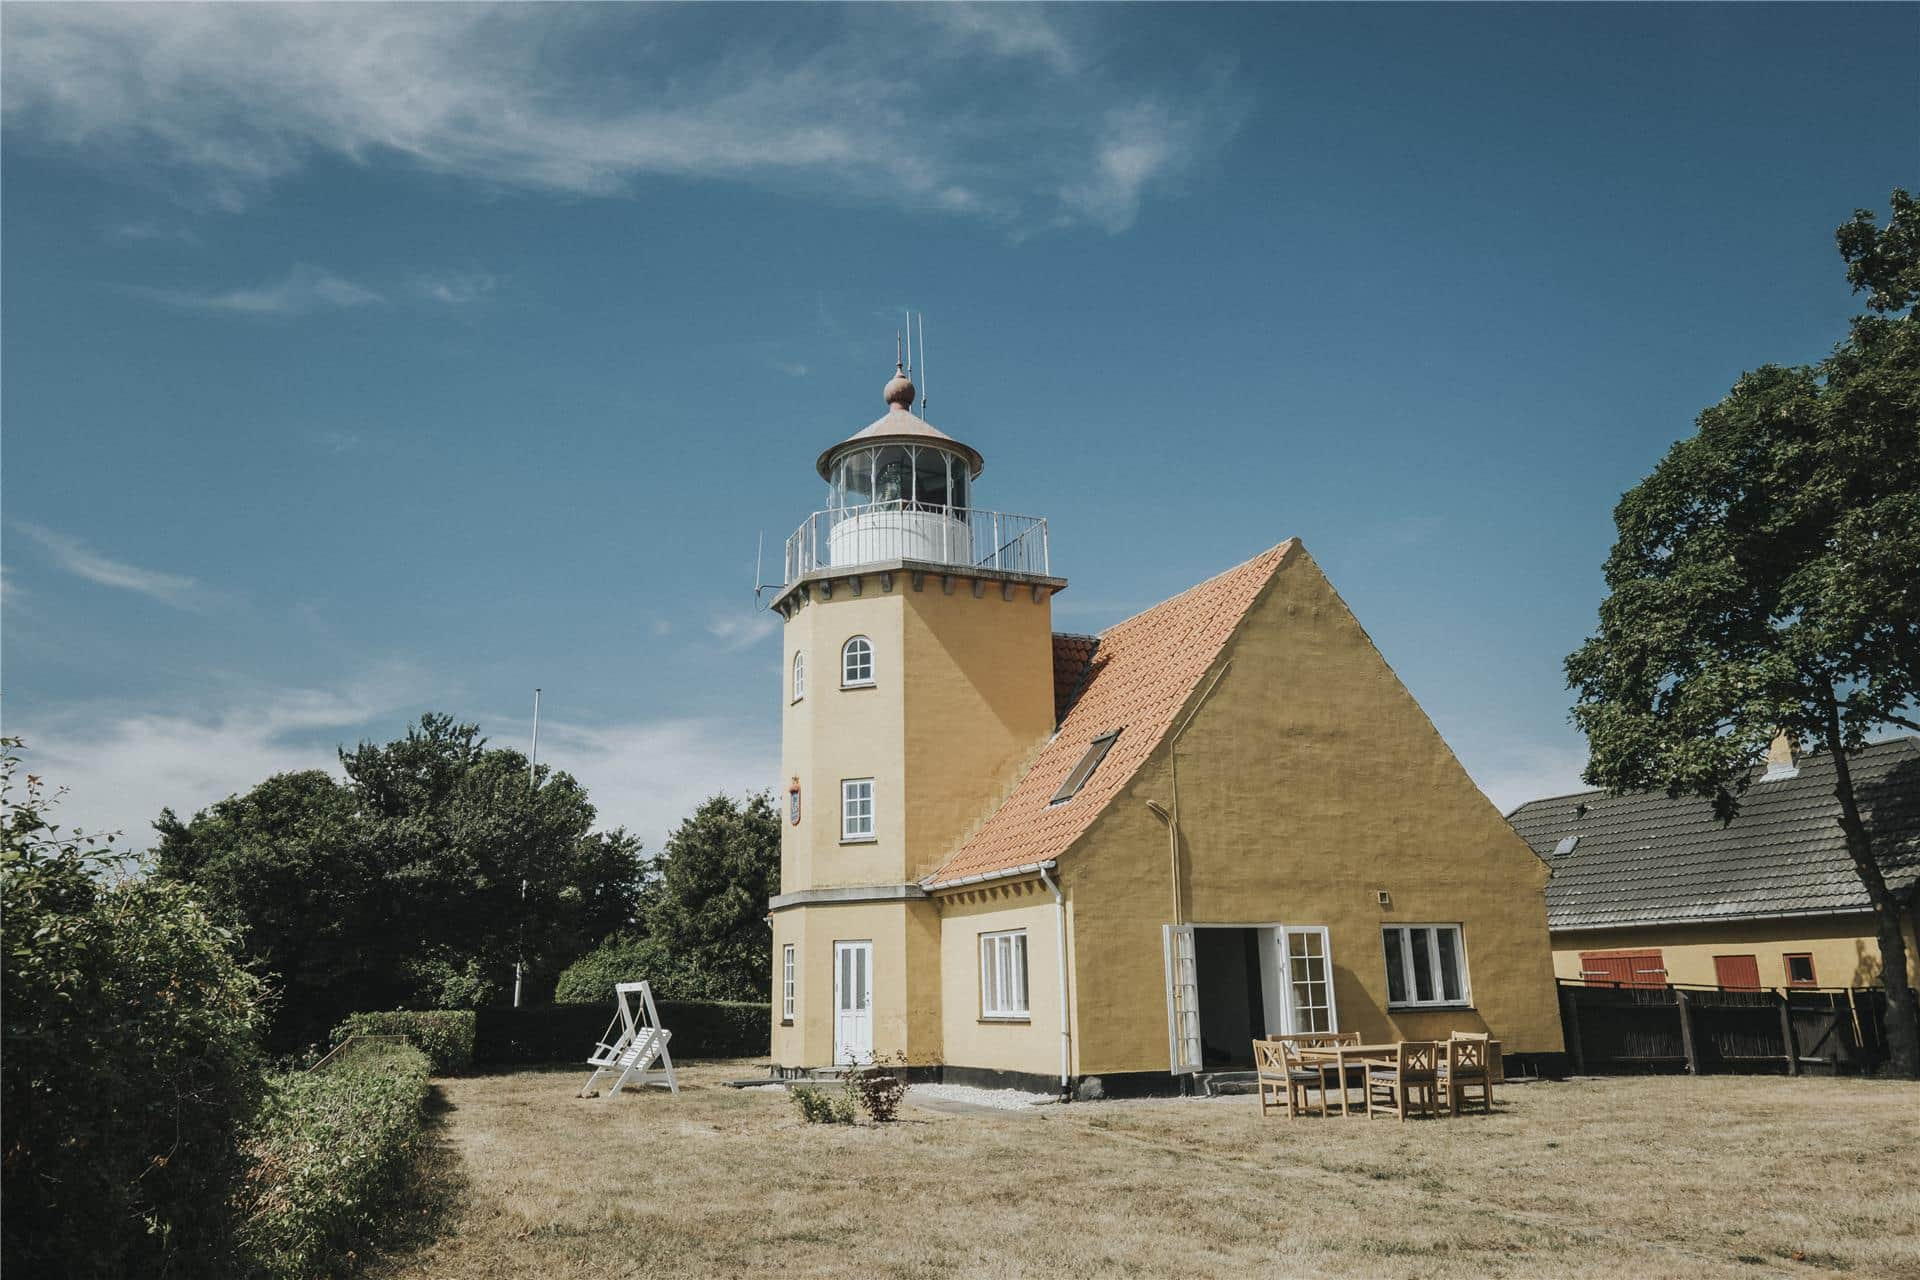 Image 1-15 Holiday-home 4200, Fyrvej 5, DK - 4791 Borre